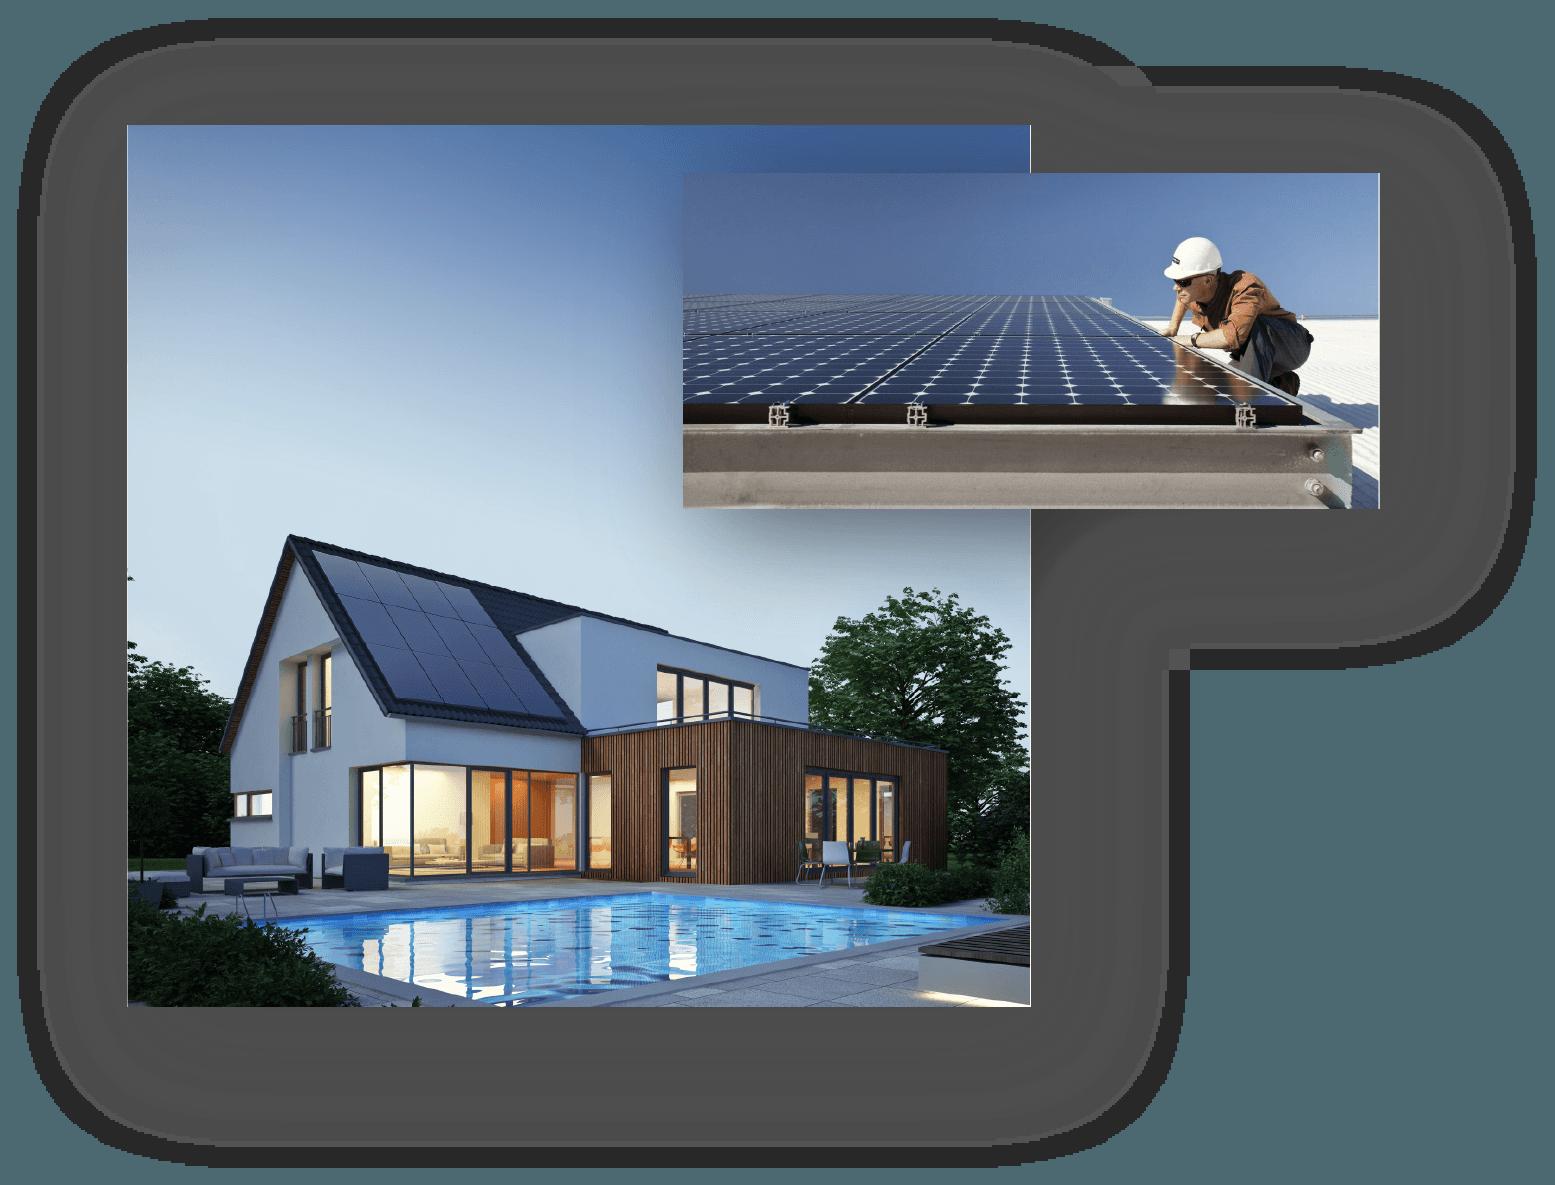 A Long Island solar company captures solar energy for your home